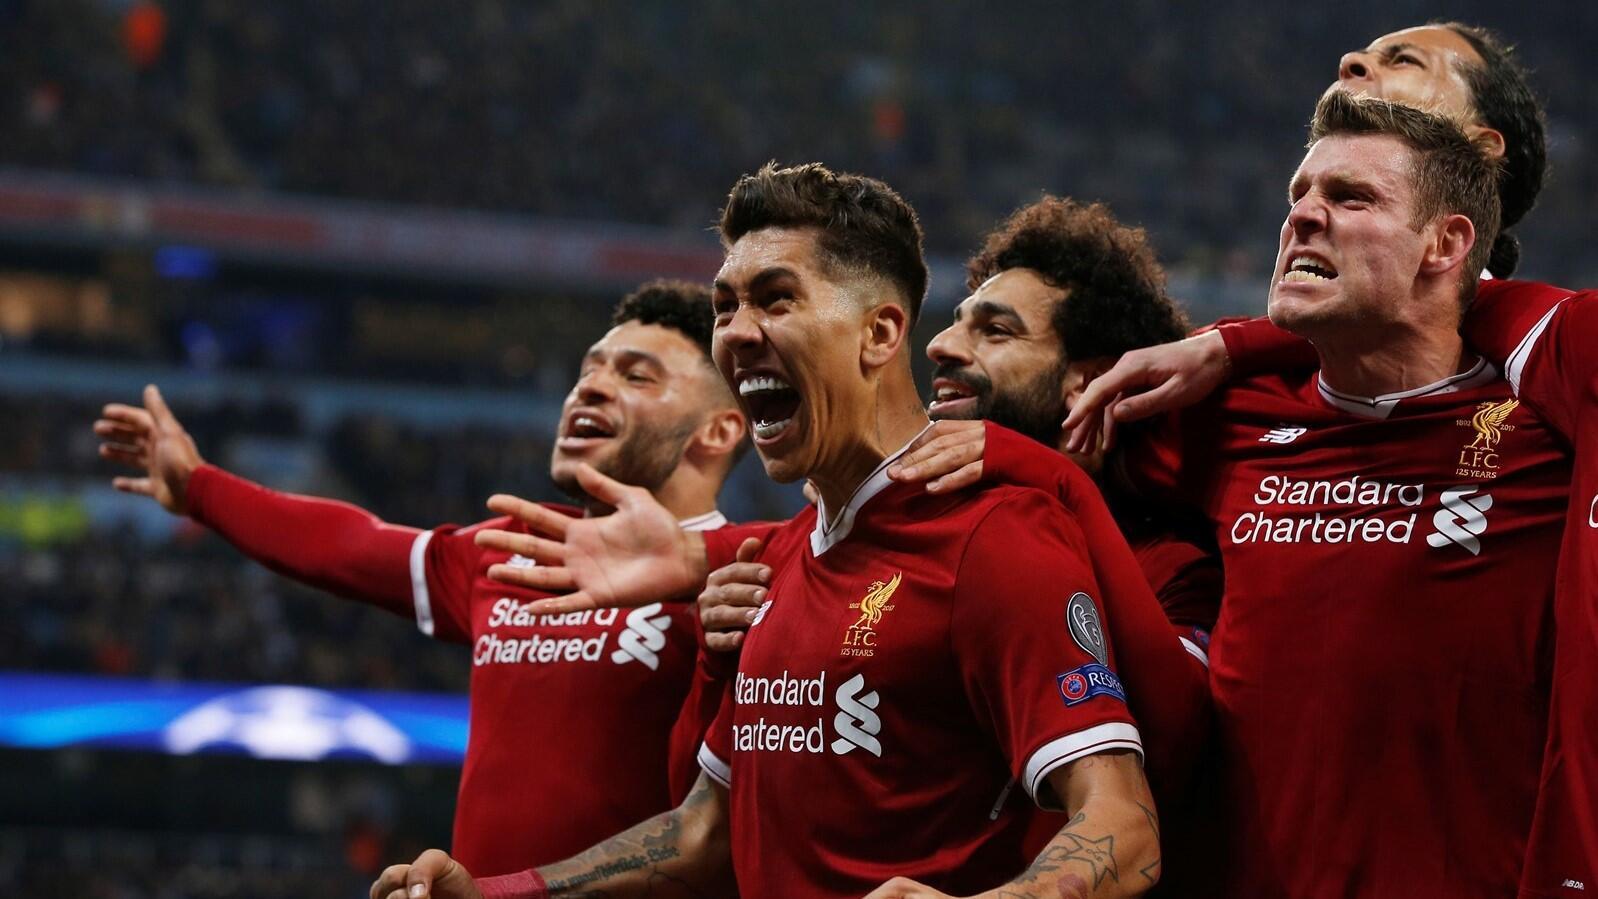 Analisis: Fleksibilitas Liverpool Buyarkan Imaji Kesempurnaan City